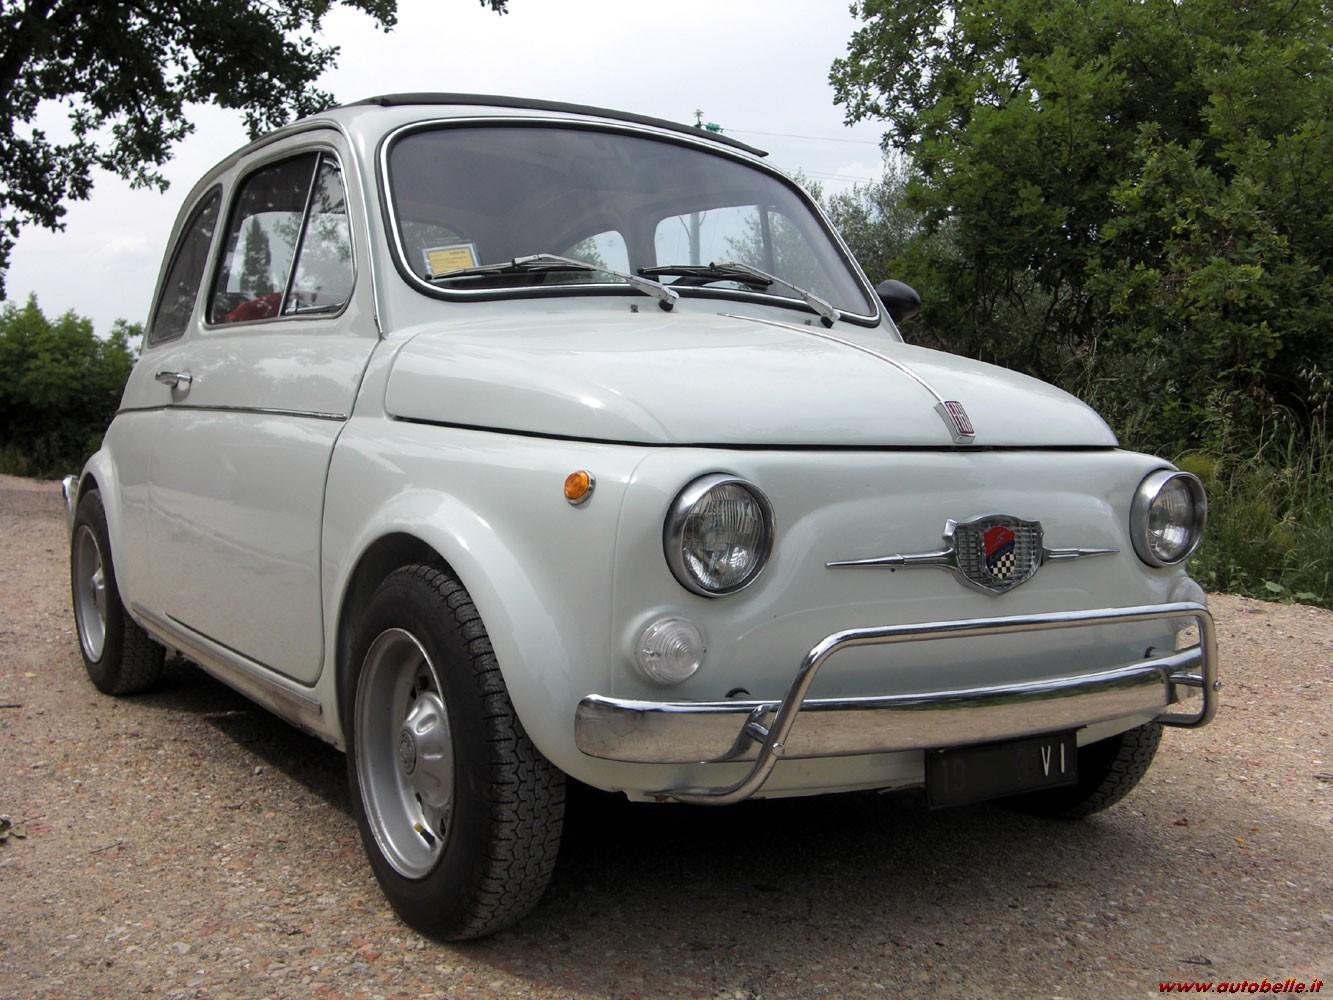 For Sale Fiat 500 Tvs L Giannini Original